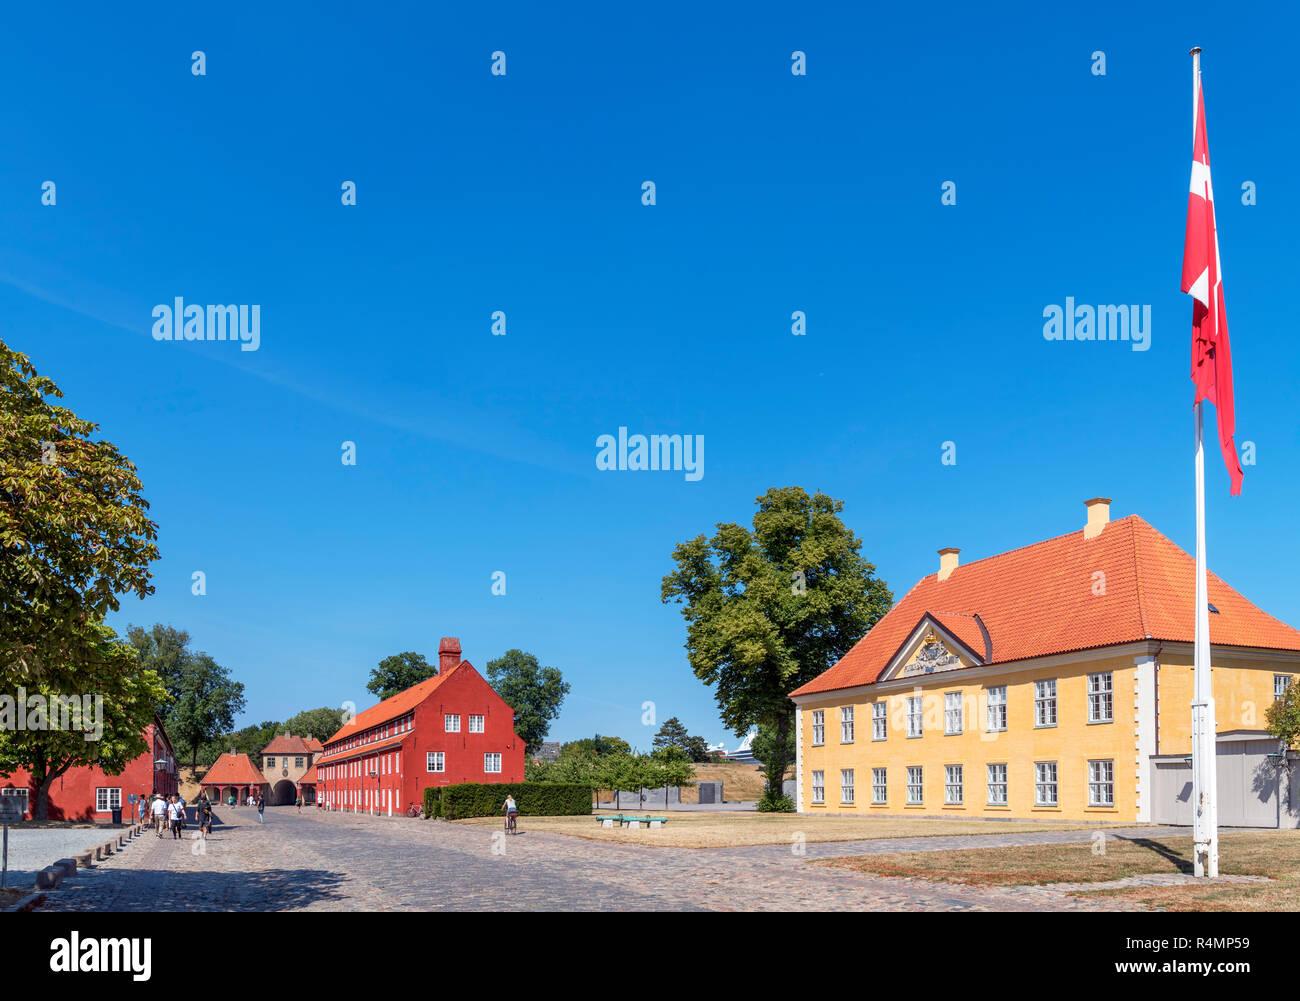 Army barracks in the Kastellet (Citadel), Copenhagen, Denmark - Stock Image